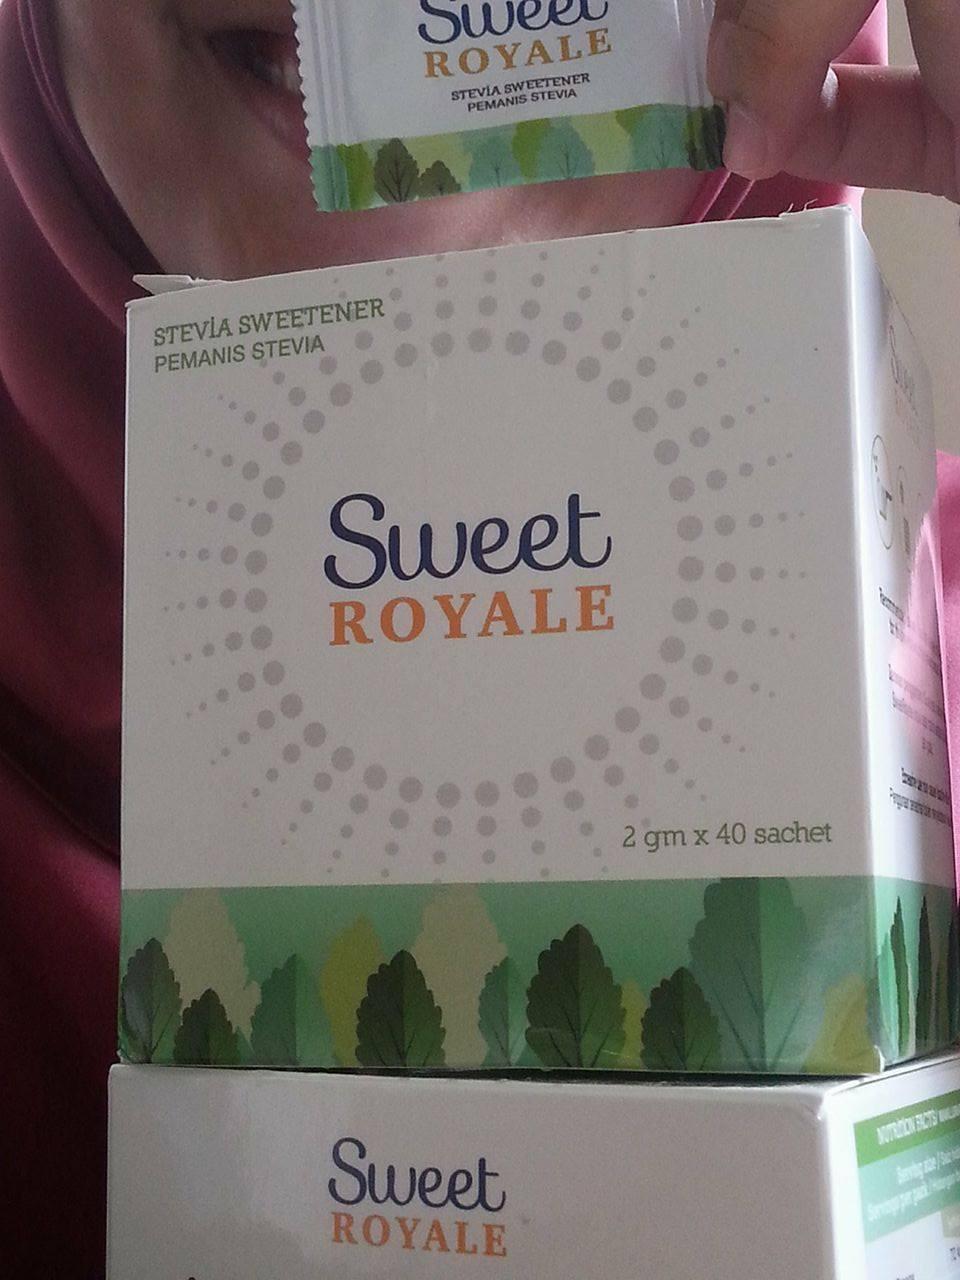 best lah SweetRoyale Stevia Halal ni!